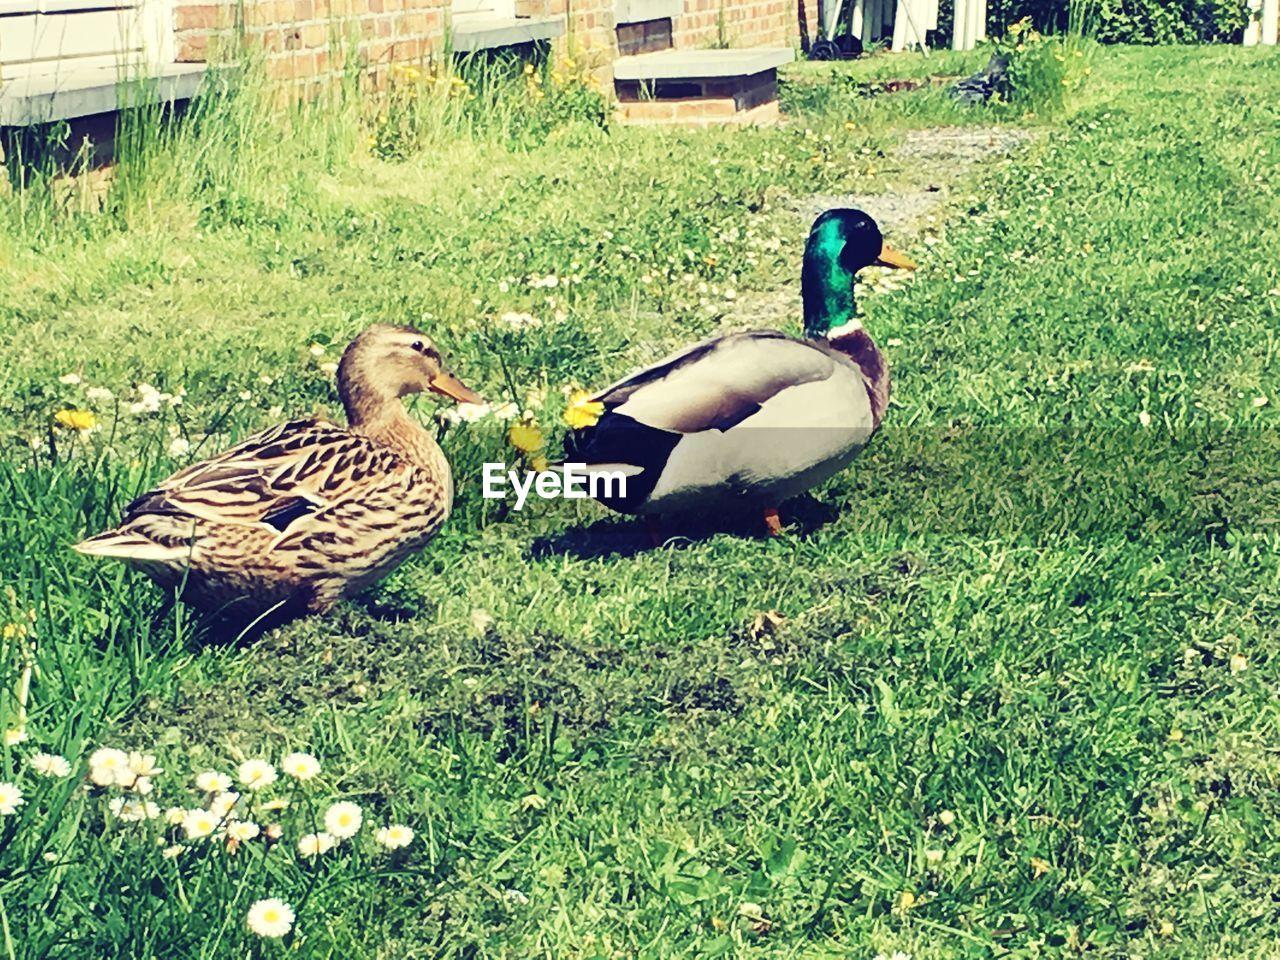 TWO BIRDS ON GRASSY FIELD